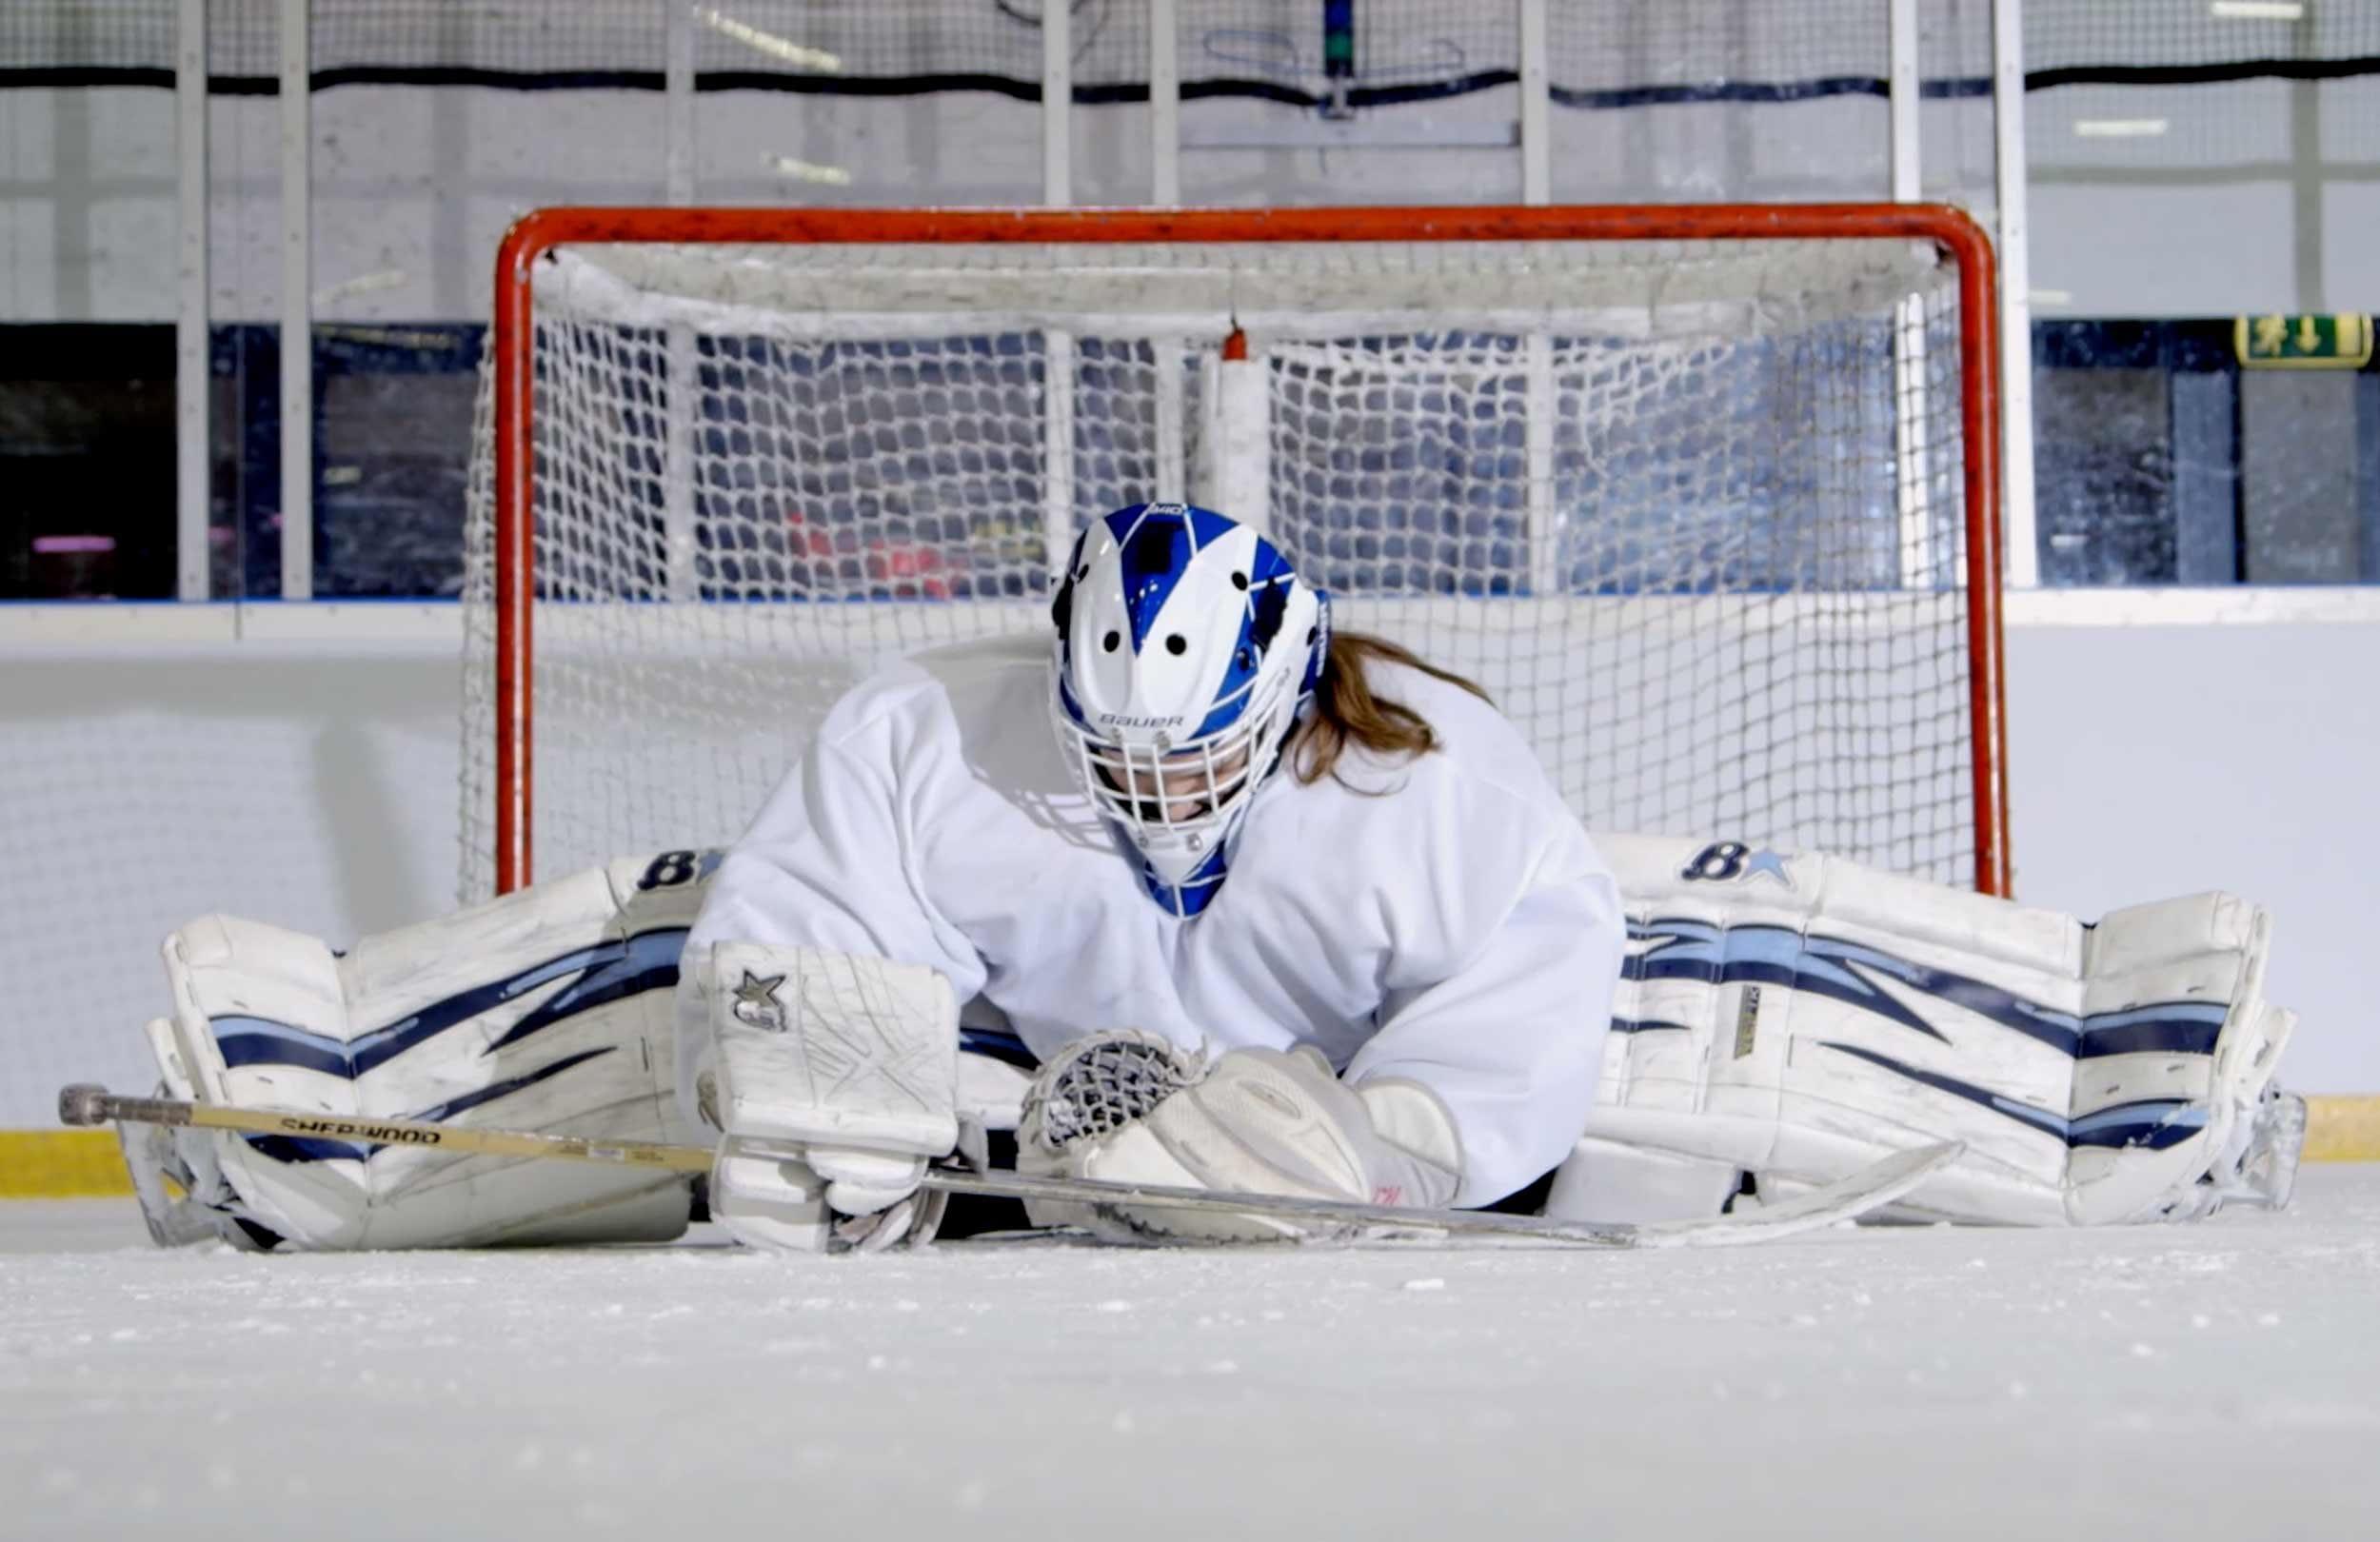 Ice hockey goalkeeper does the splits